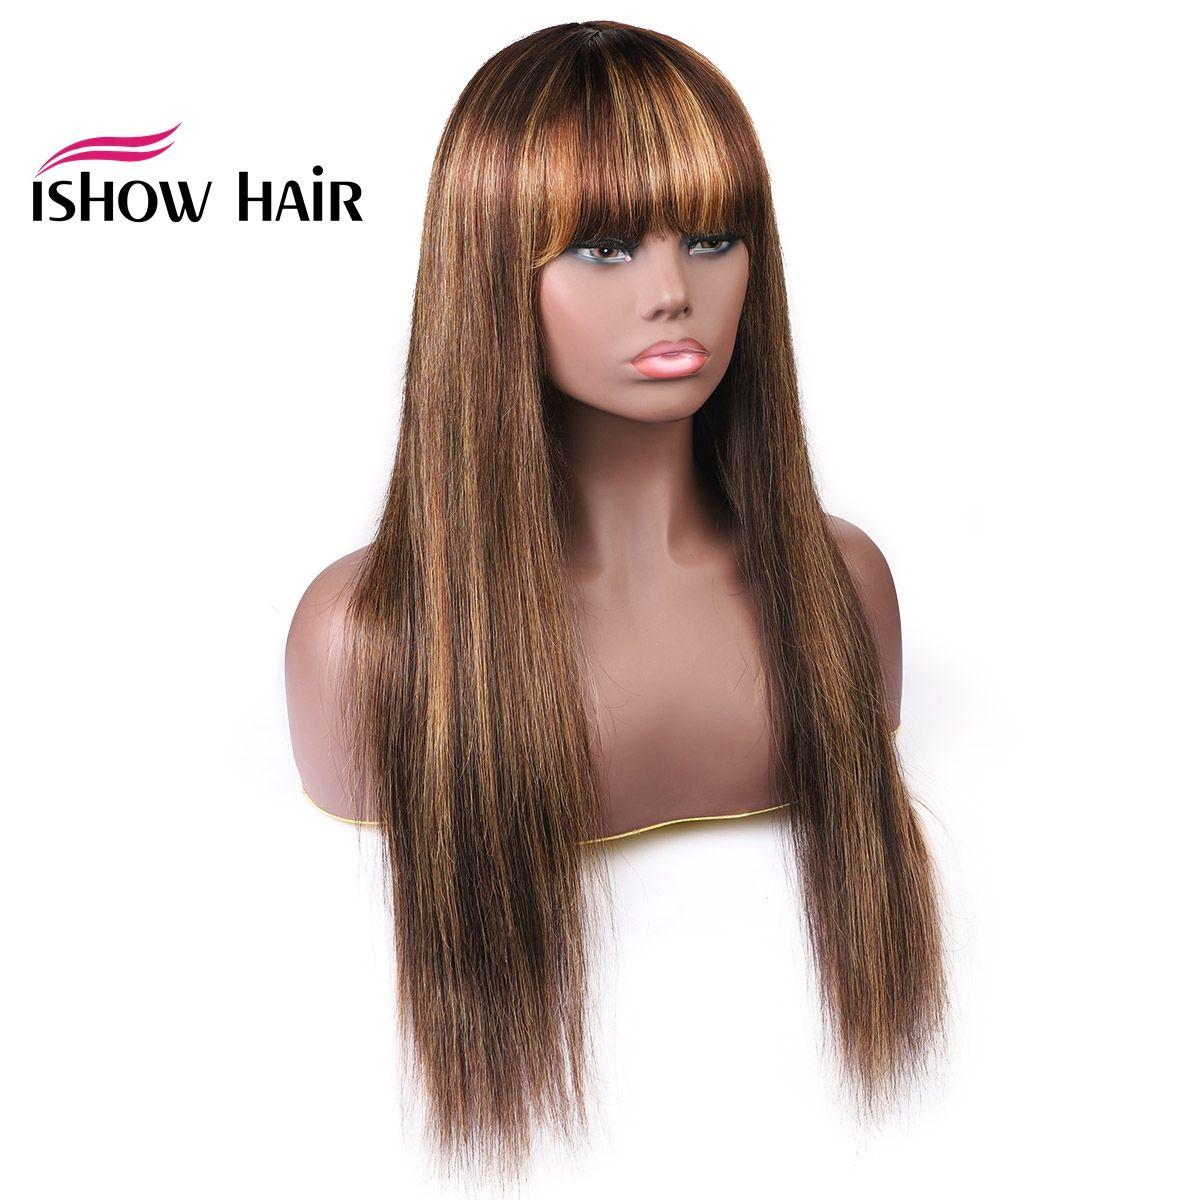 ISHOW Renkli Düz Peruk Perulu İnsan Saç Peruk Patlama ile 4/27 Turuncu Zencefil 99J İnsan Saç Yok Dantel Peruk